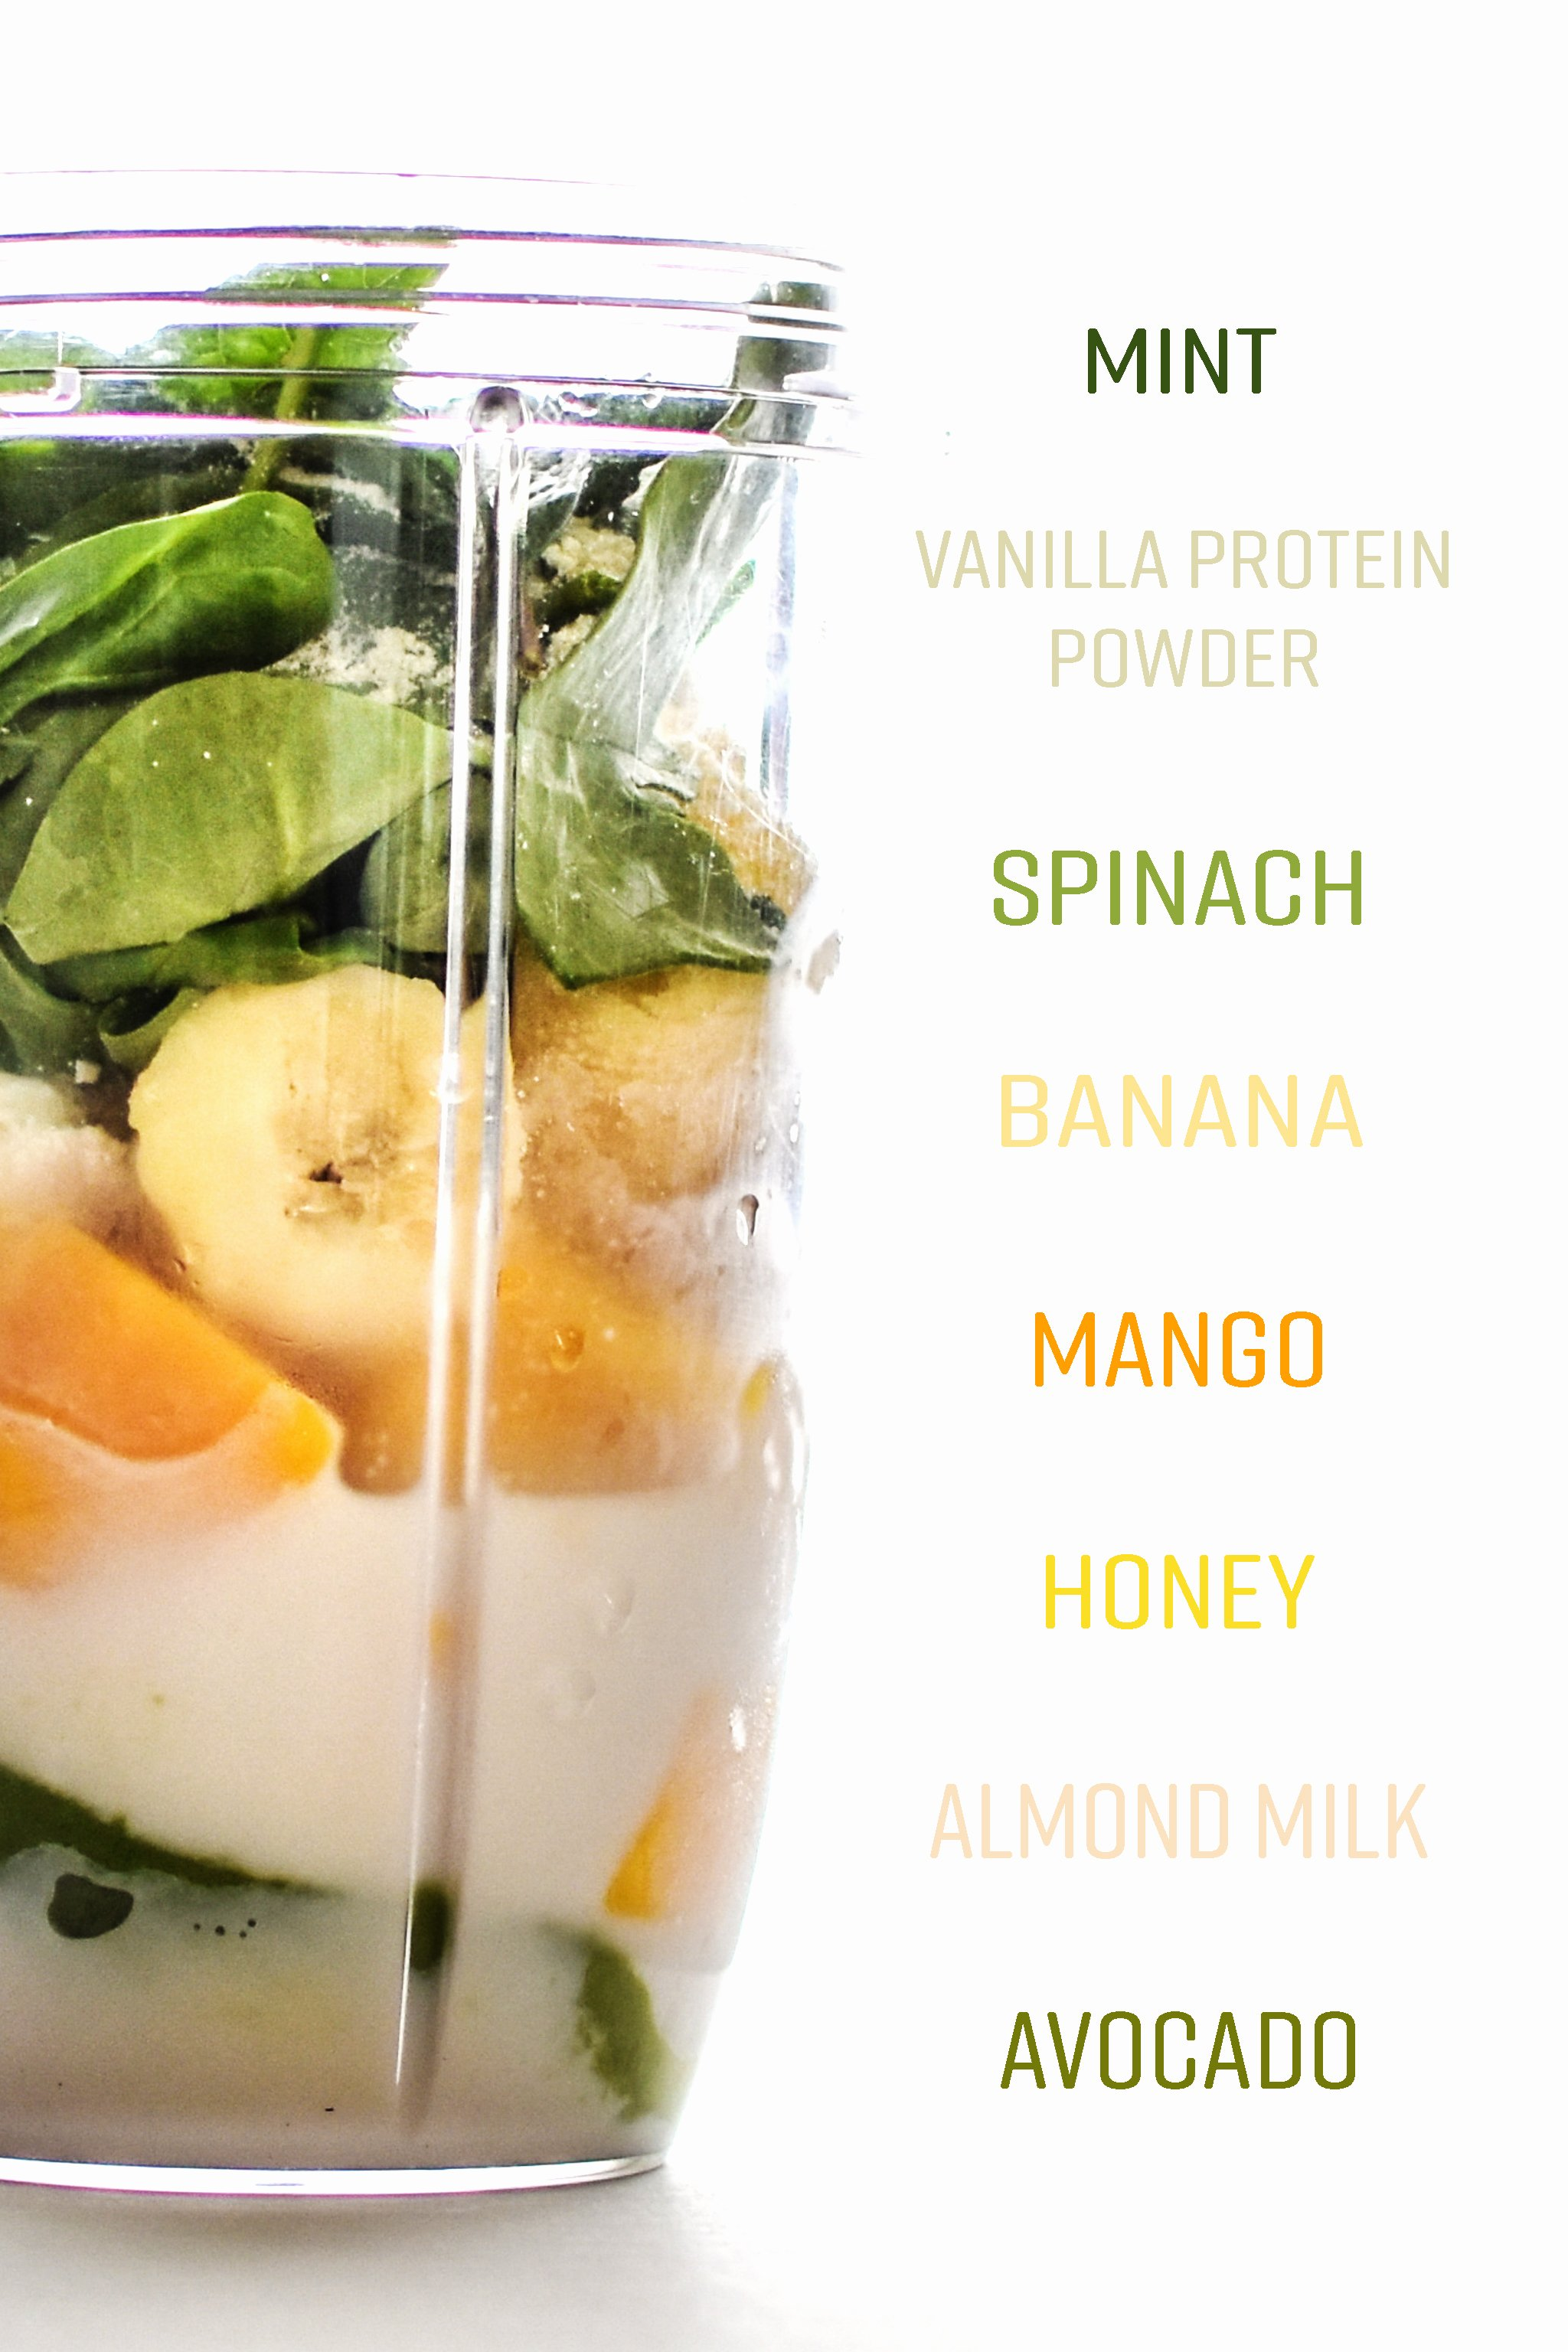 Creamy Avocado Mint Green Smoothie Recipe - Overflowing with fruits, veggies, and fresh minty goodness, like a summer shamrock shake! - ProjectMealPlan.com